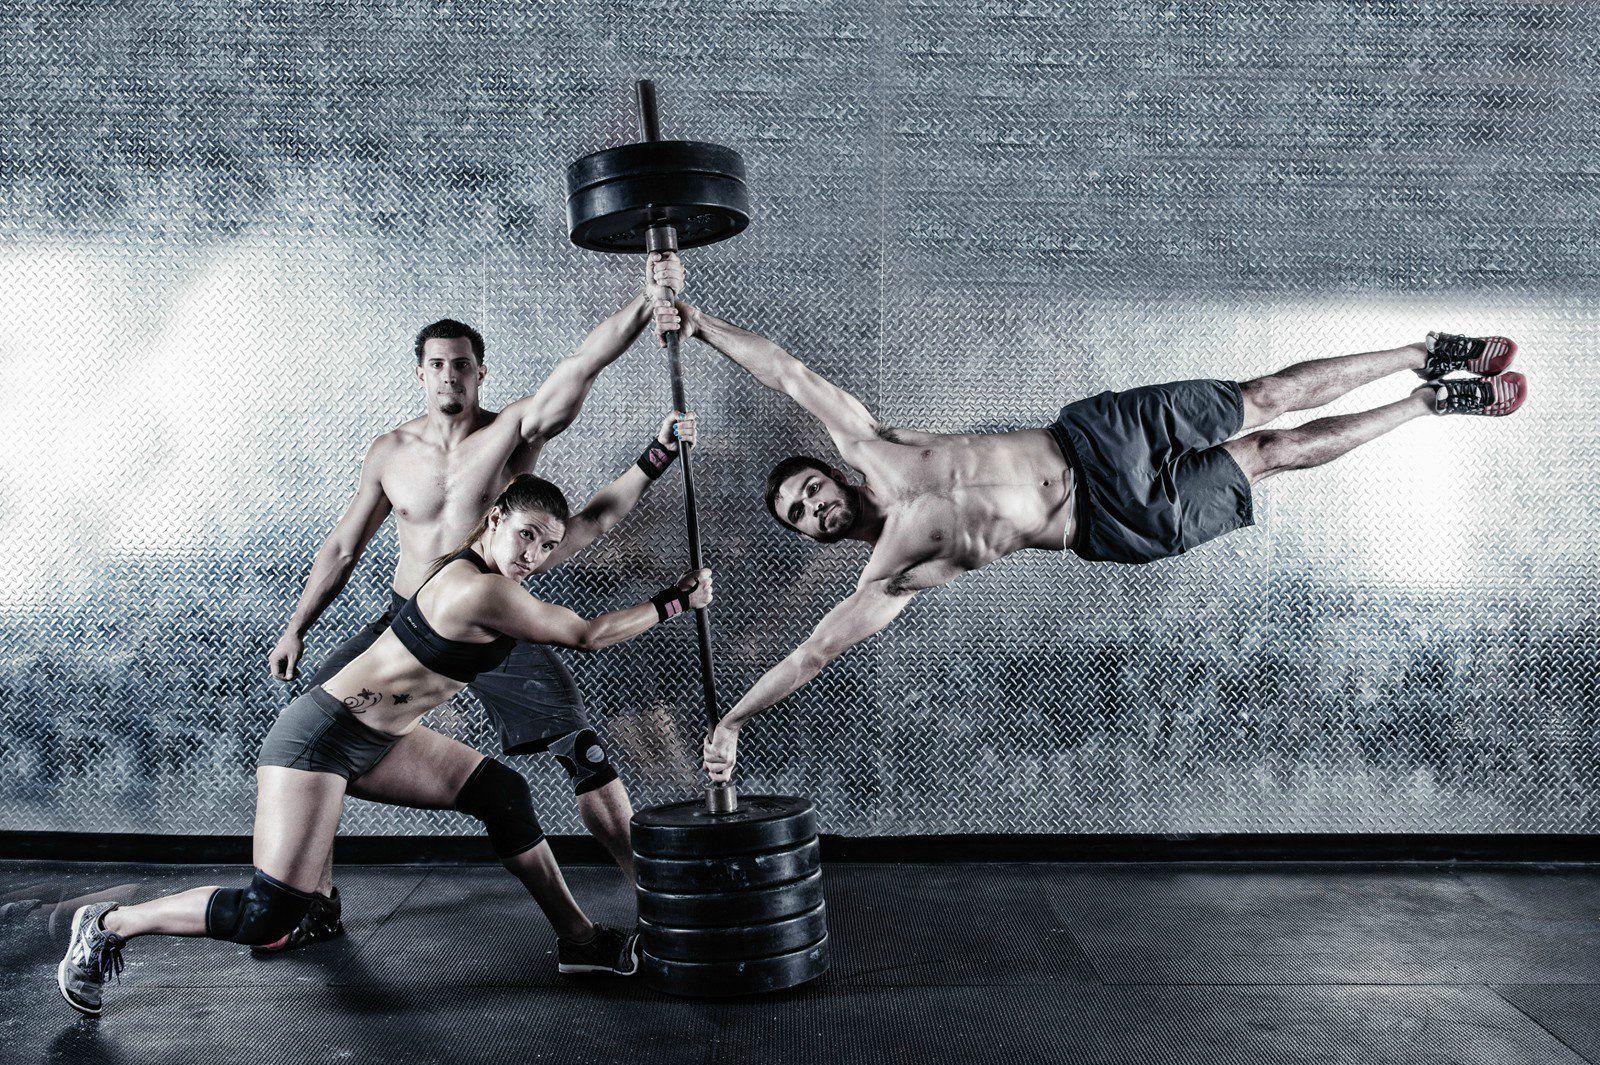 womens-mens-fitness-nisso-jaime-chalem-photography-miami-fort-lauderdale-west-palm-beach-crossfit-renzo-gracie-8253-fitness